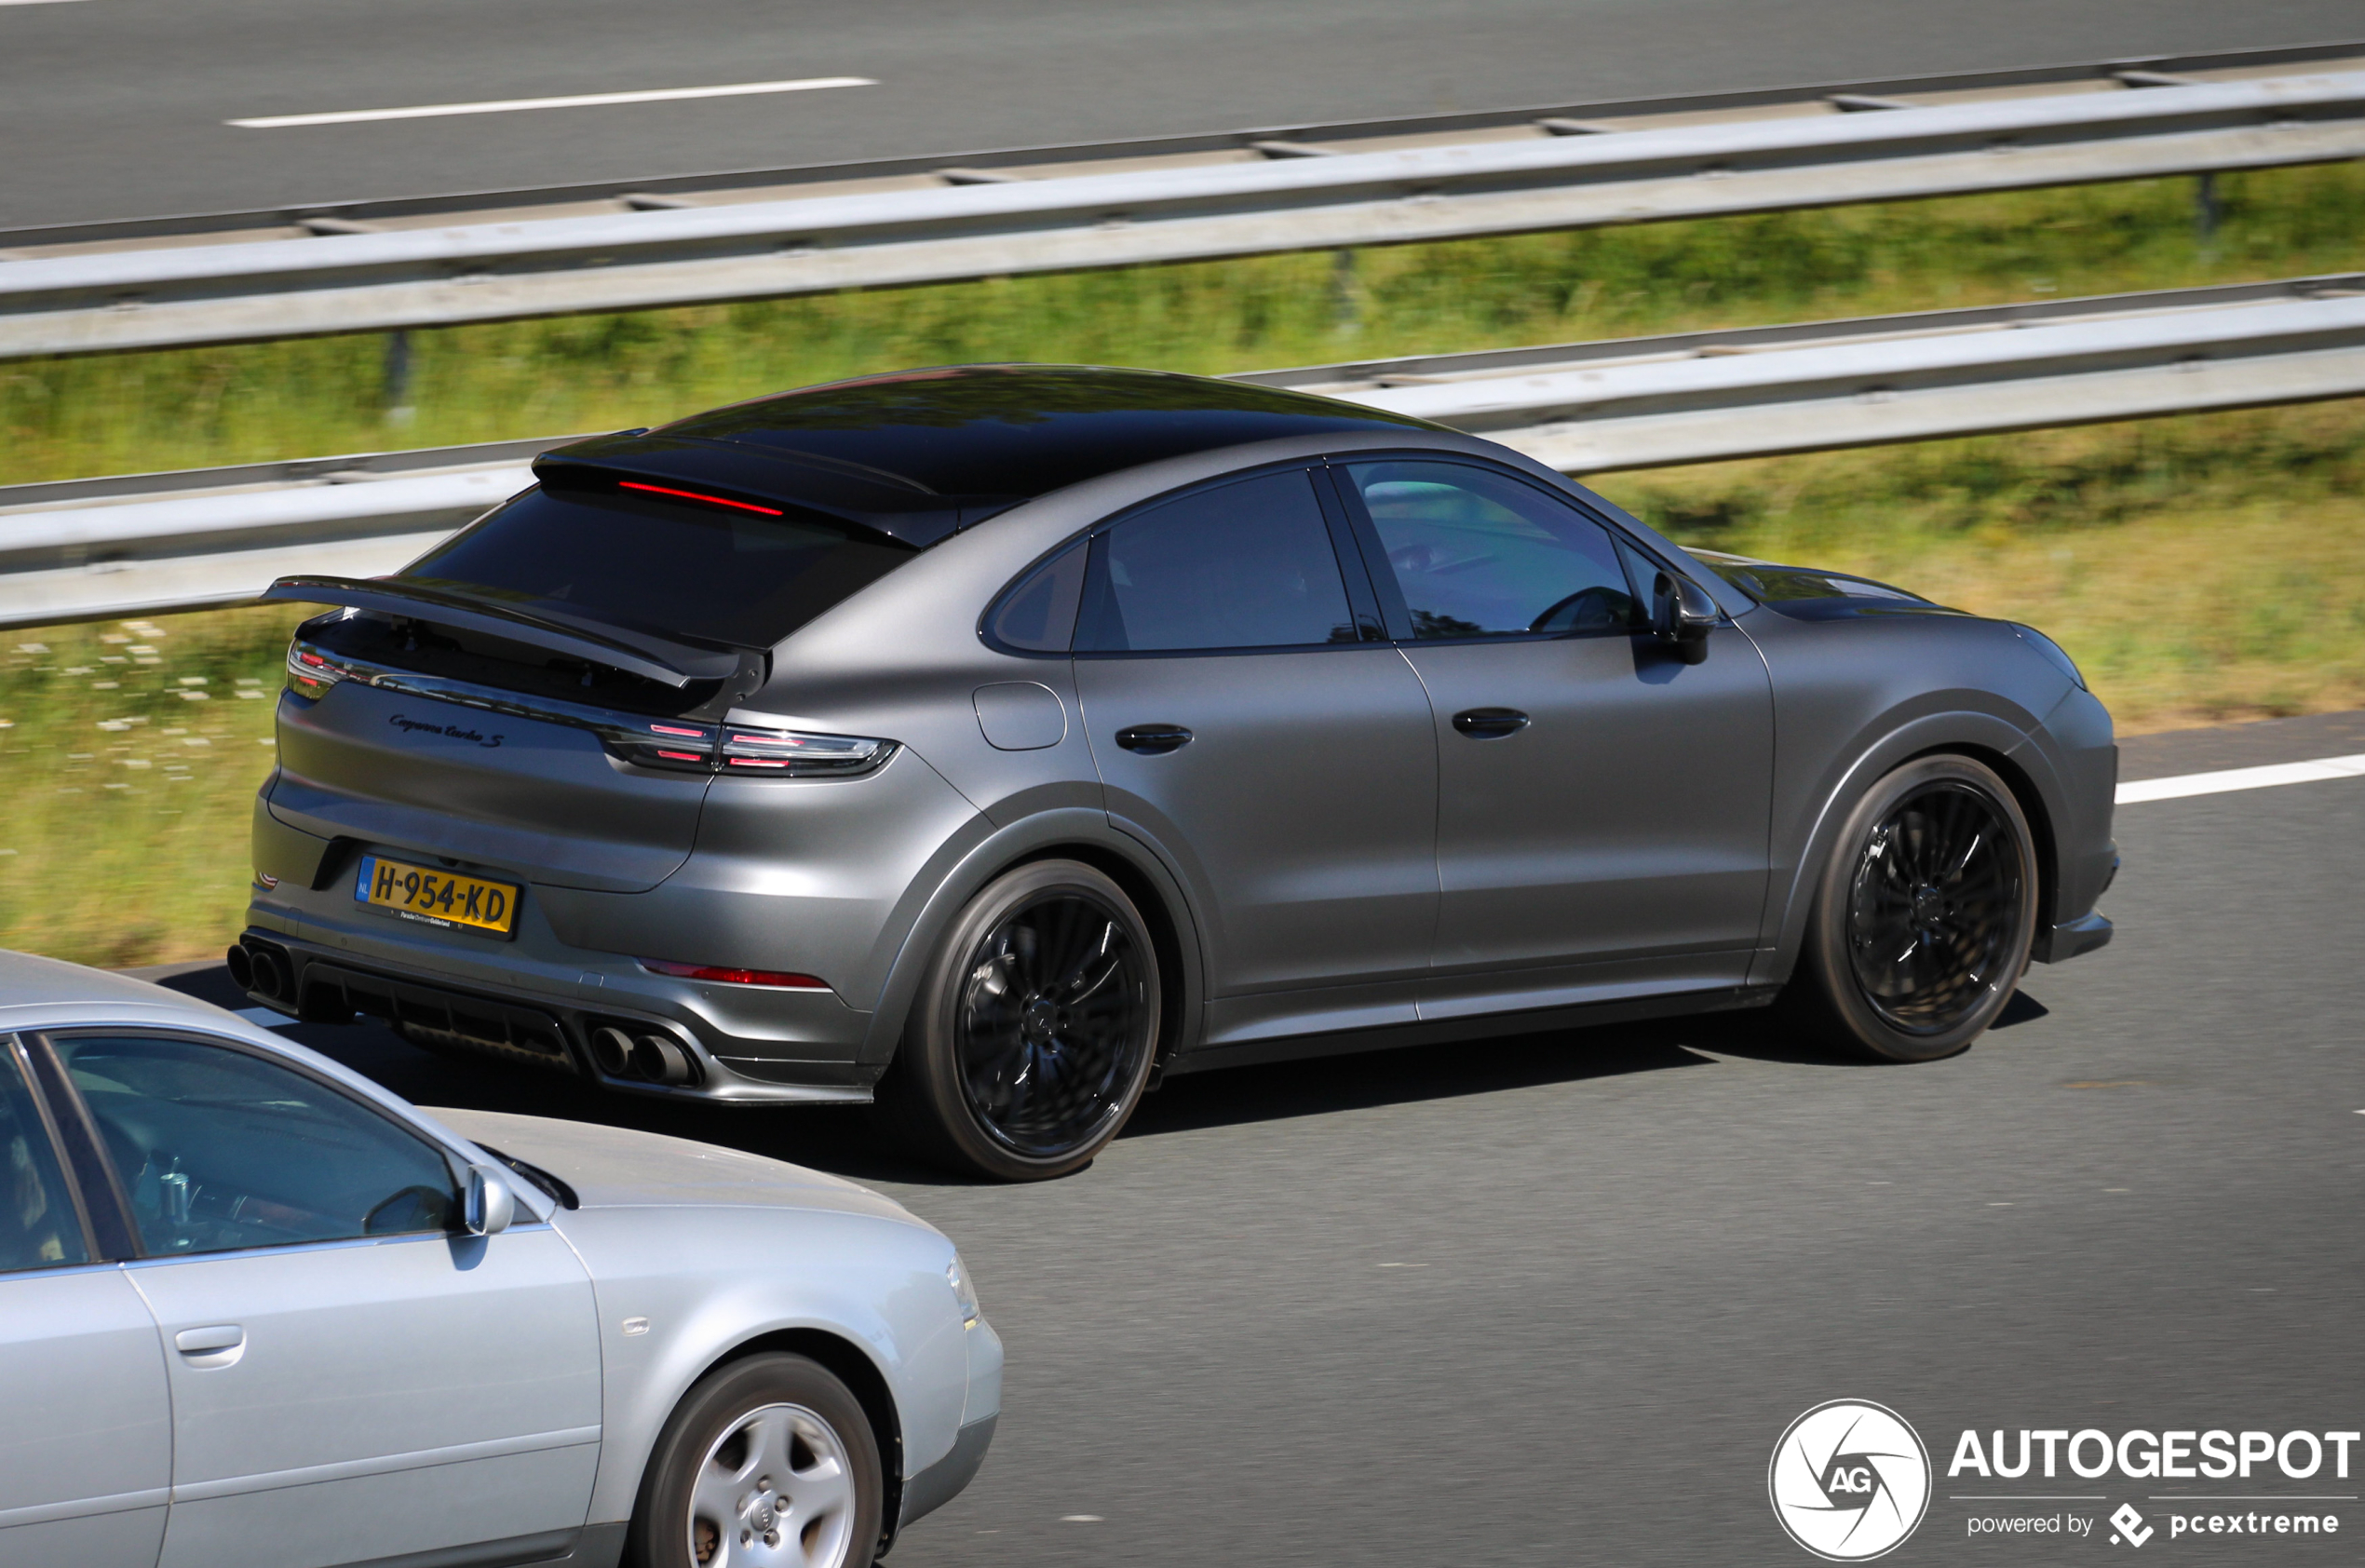 Porsche Cayenne Coupe Turbo S E Hybrid Techart 24 April 2020 Autogespot